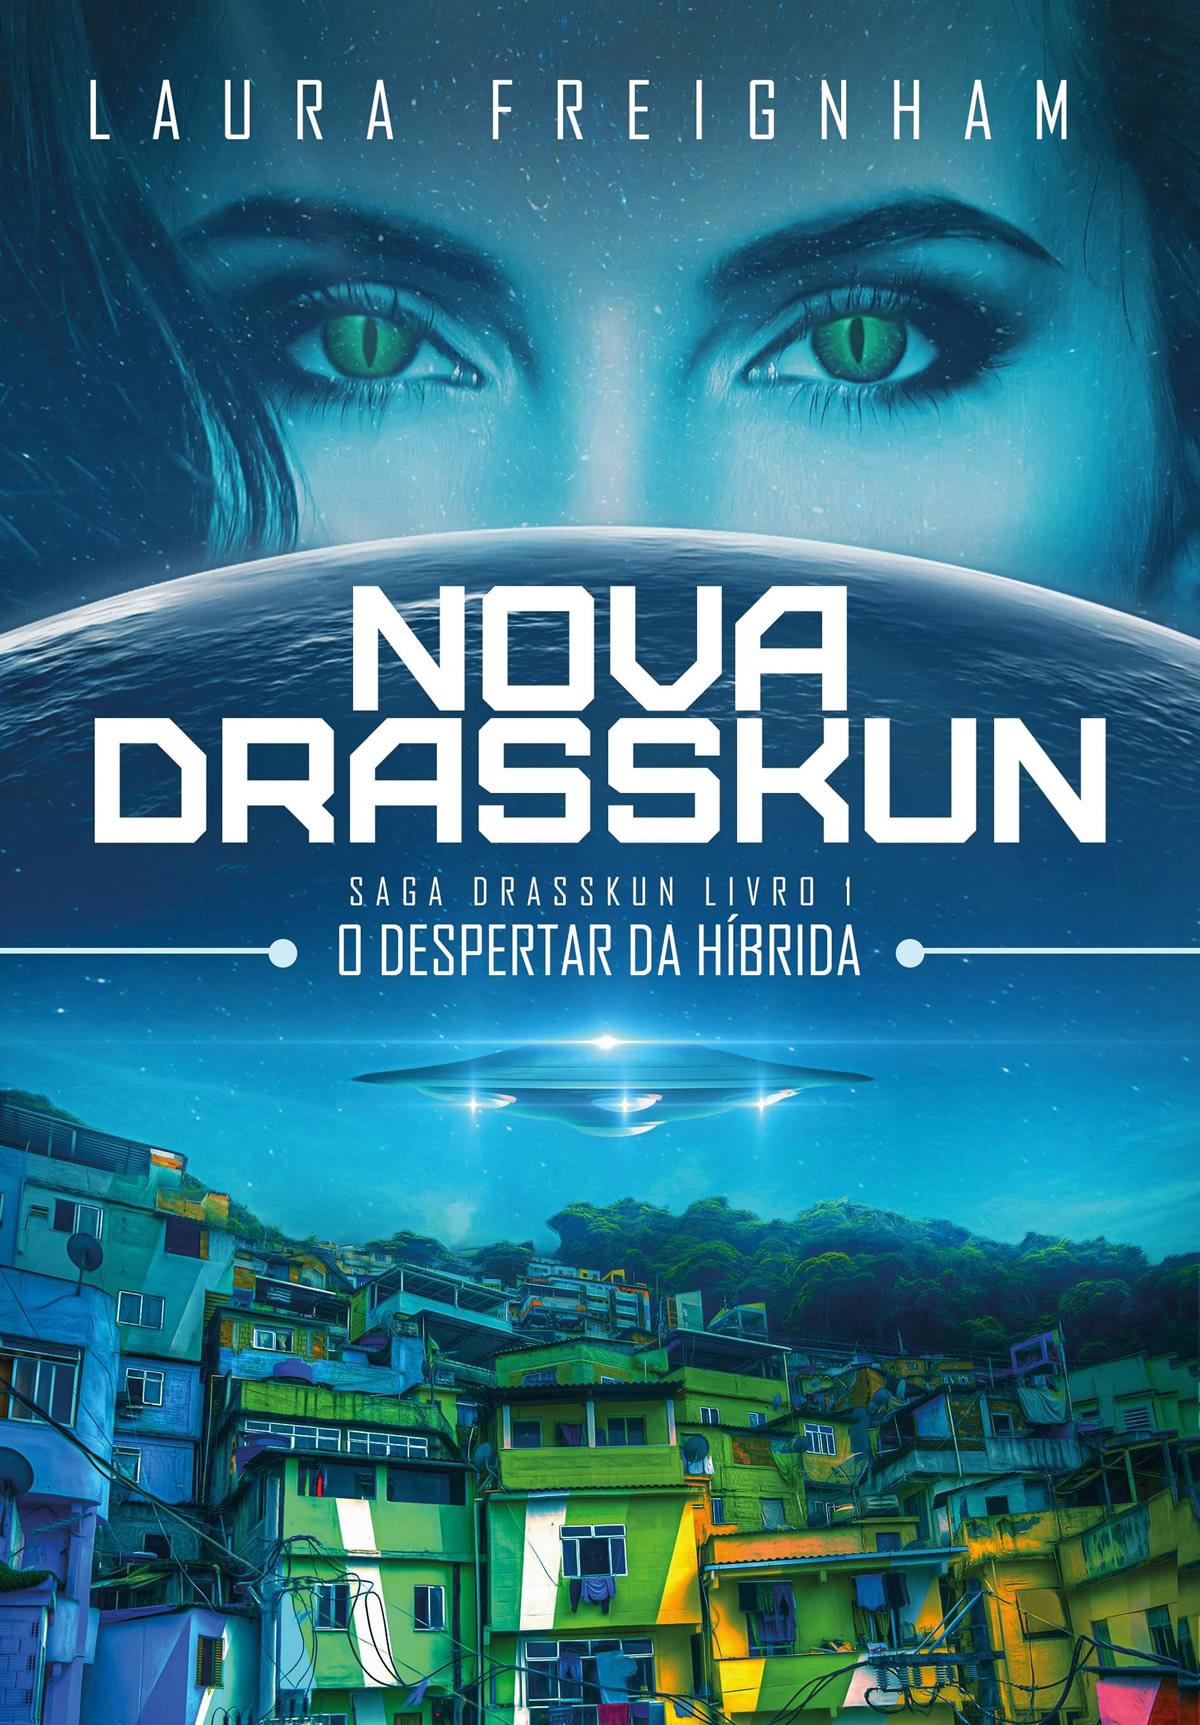 Nova Drasskun - O Despertar da Híbrida, Saga Drasskus Livro 1